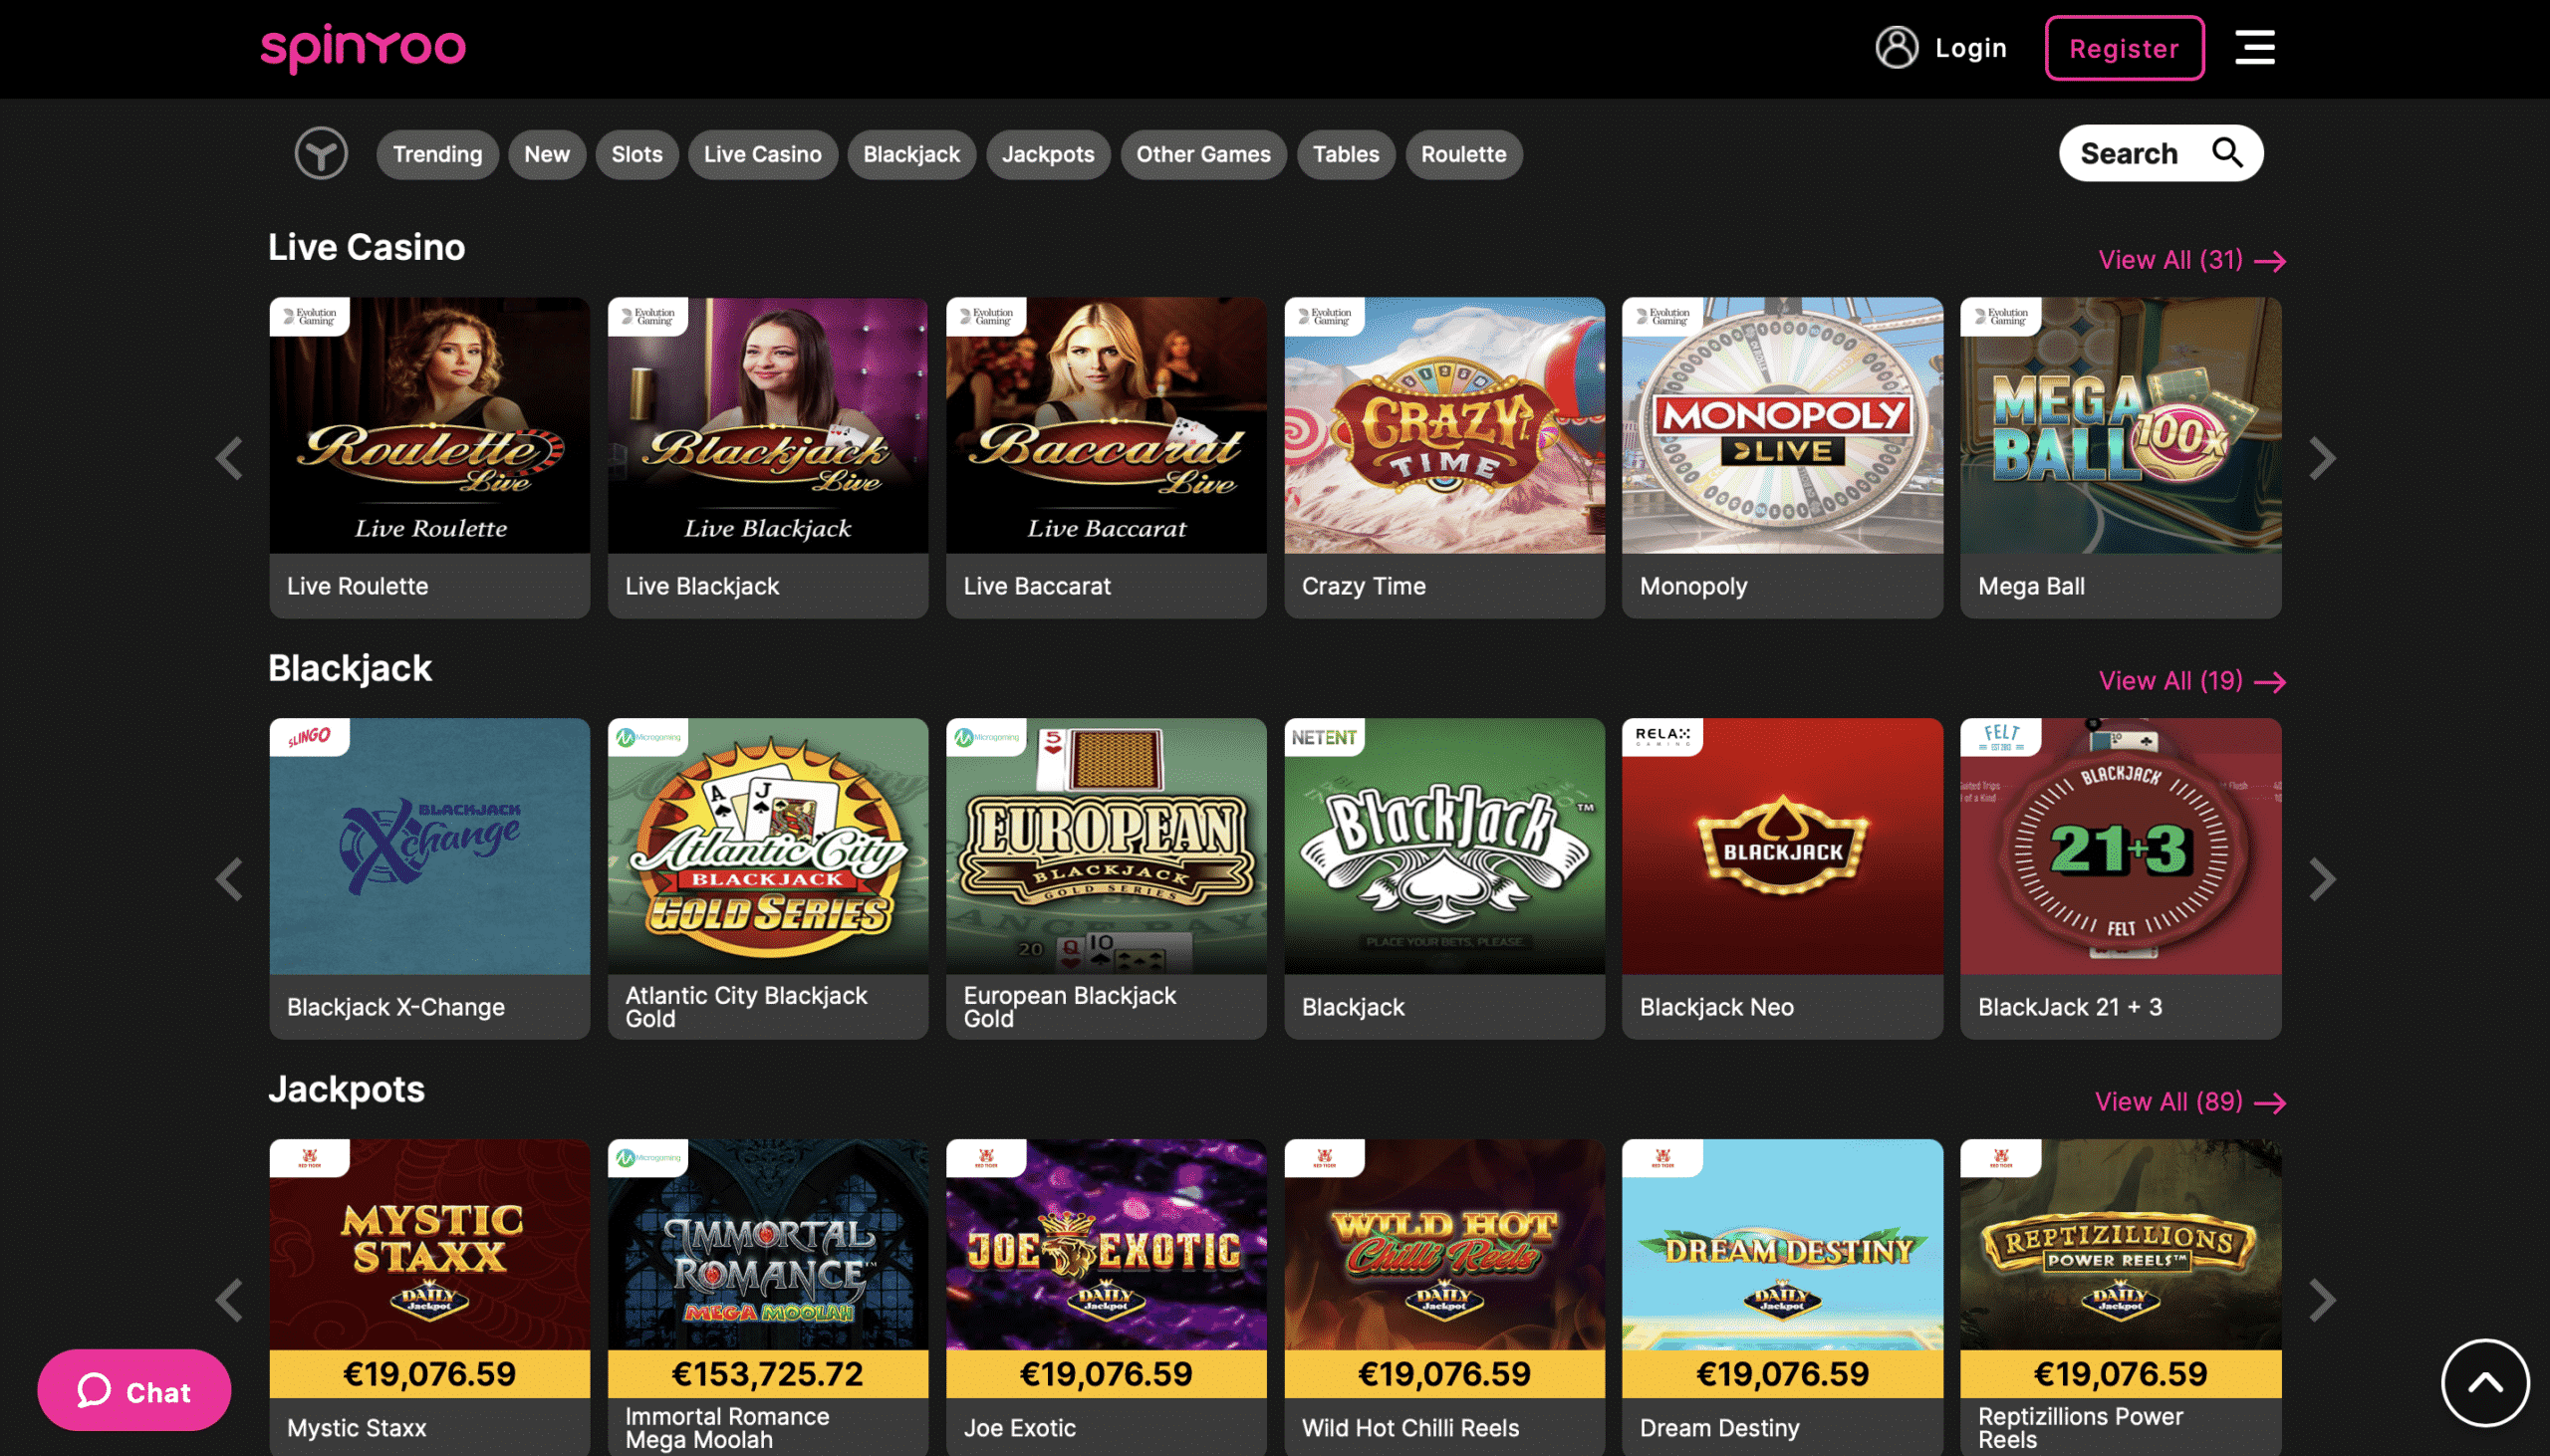 SpinYoo Live Casino